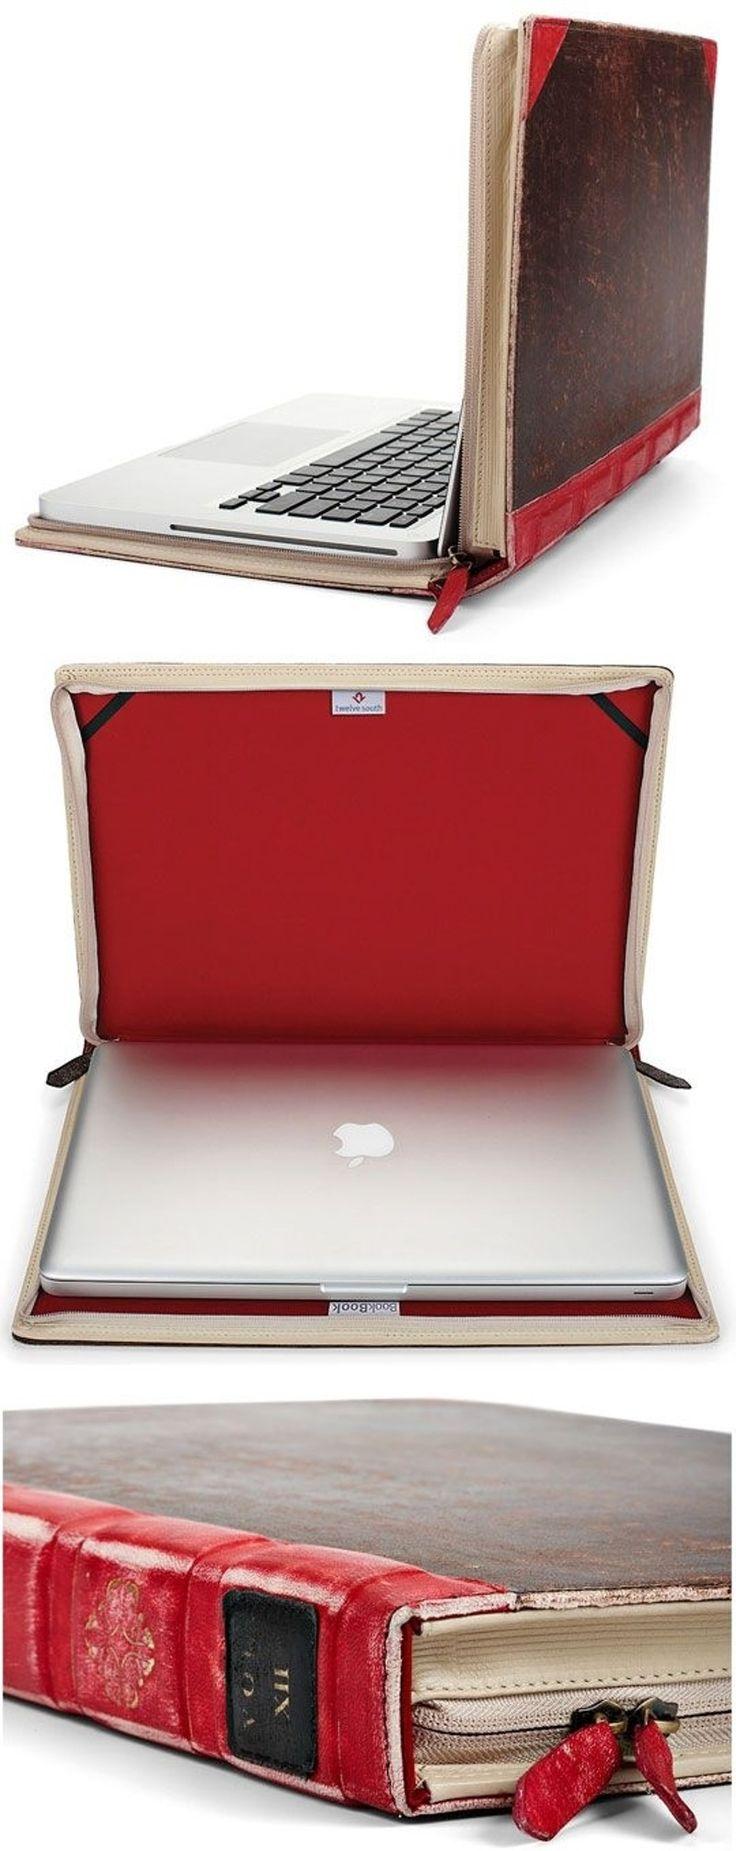 25 Best Tablet Cases Ideas On Pinterest Tablet Tablet